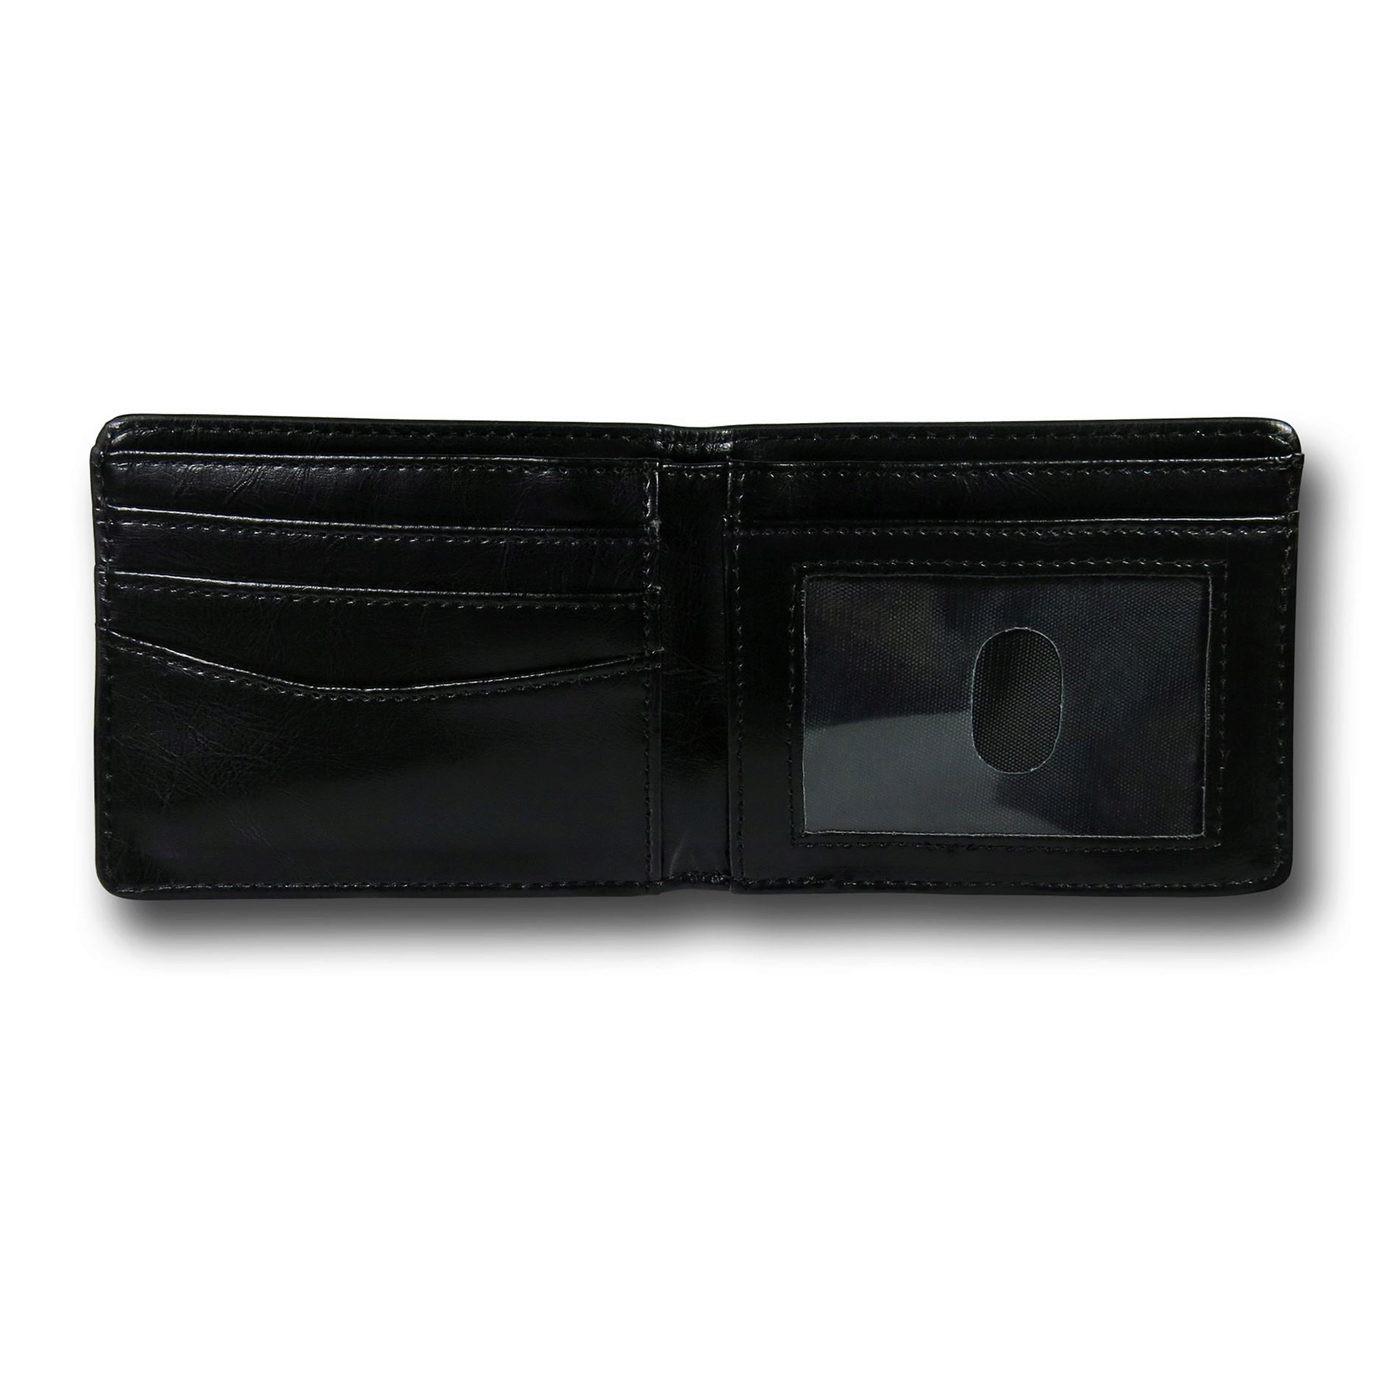 Transformers Decepticon & Crossbones Bi-Fold Wallet